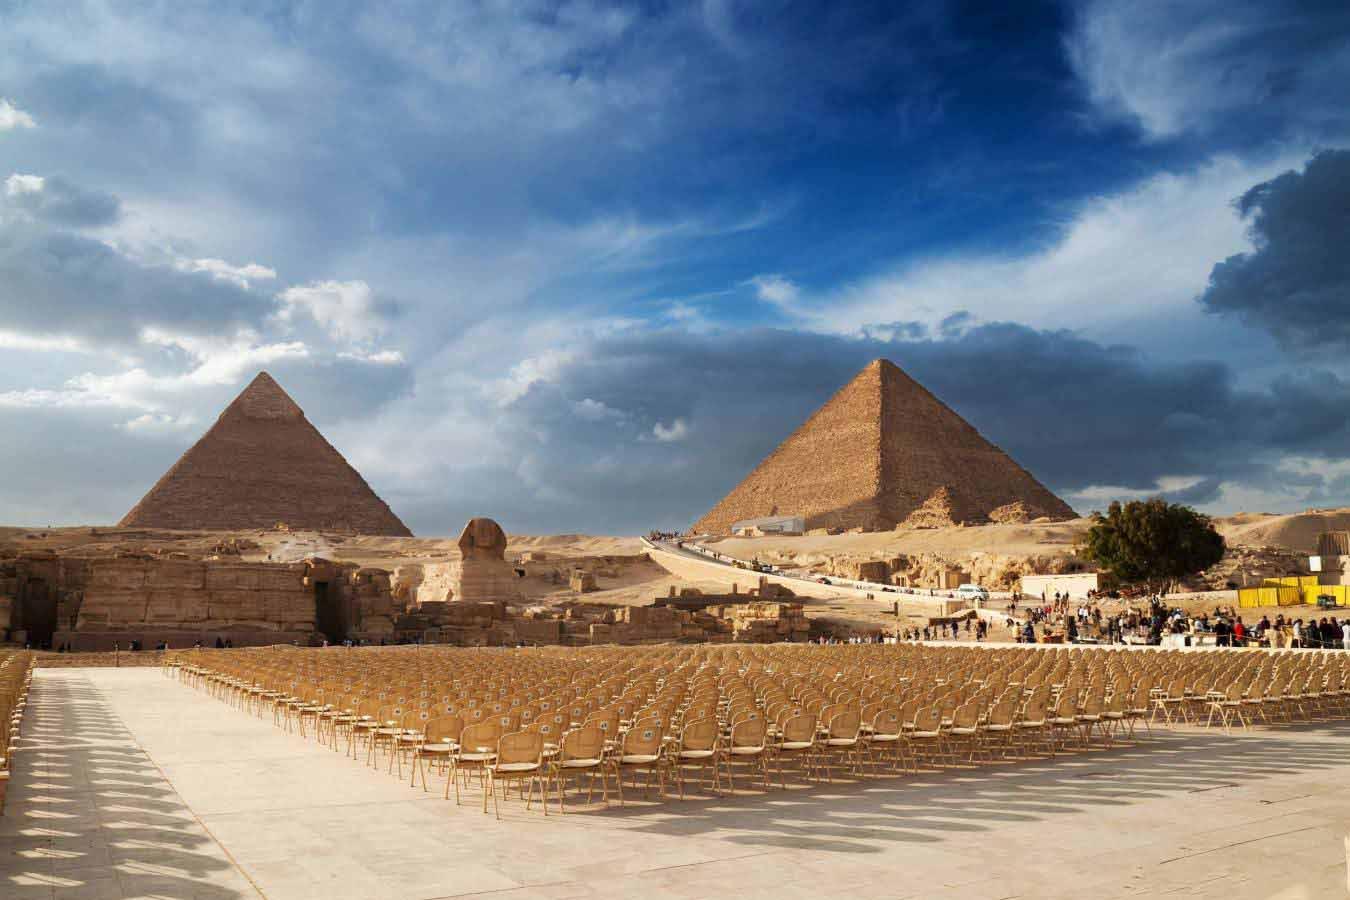 2.Cairo, Egypt